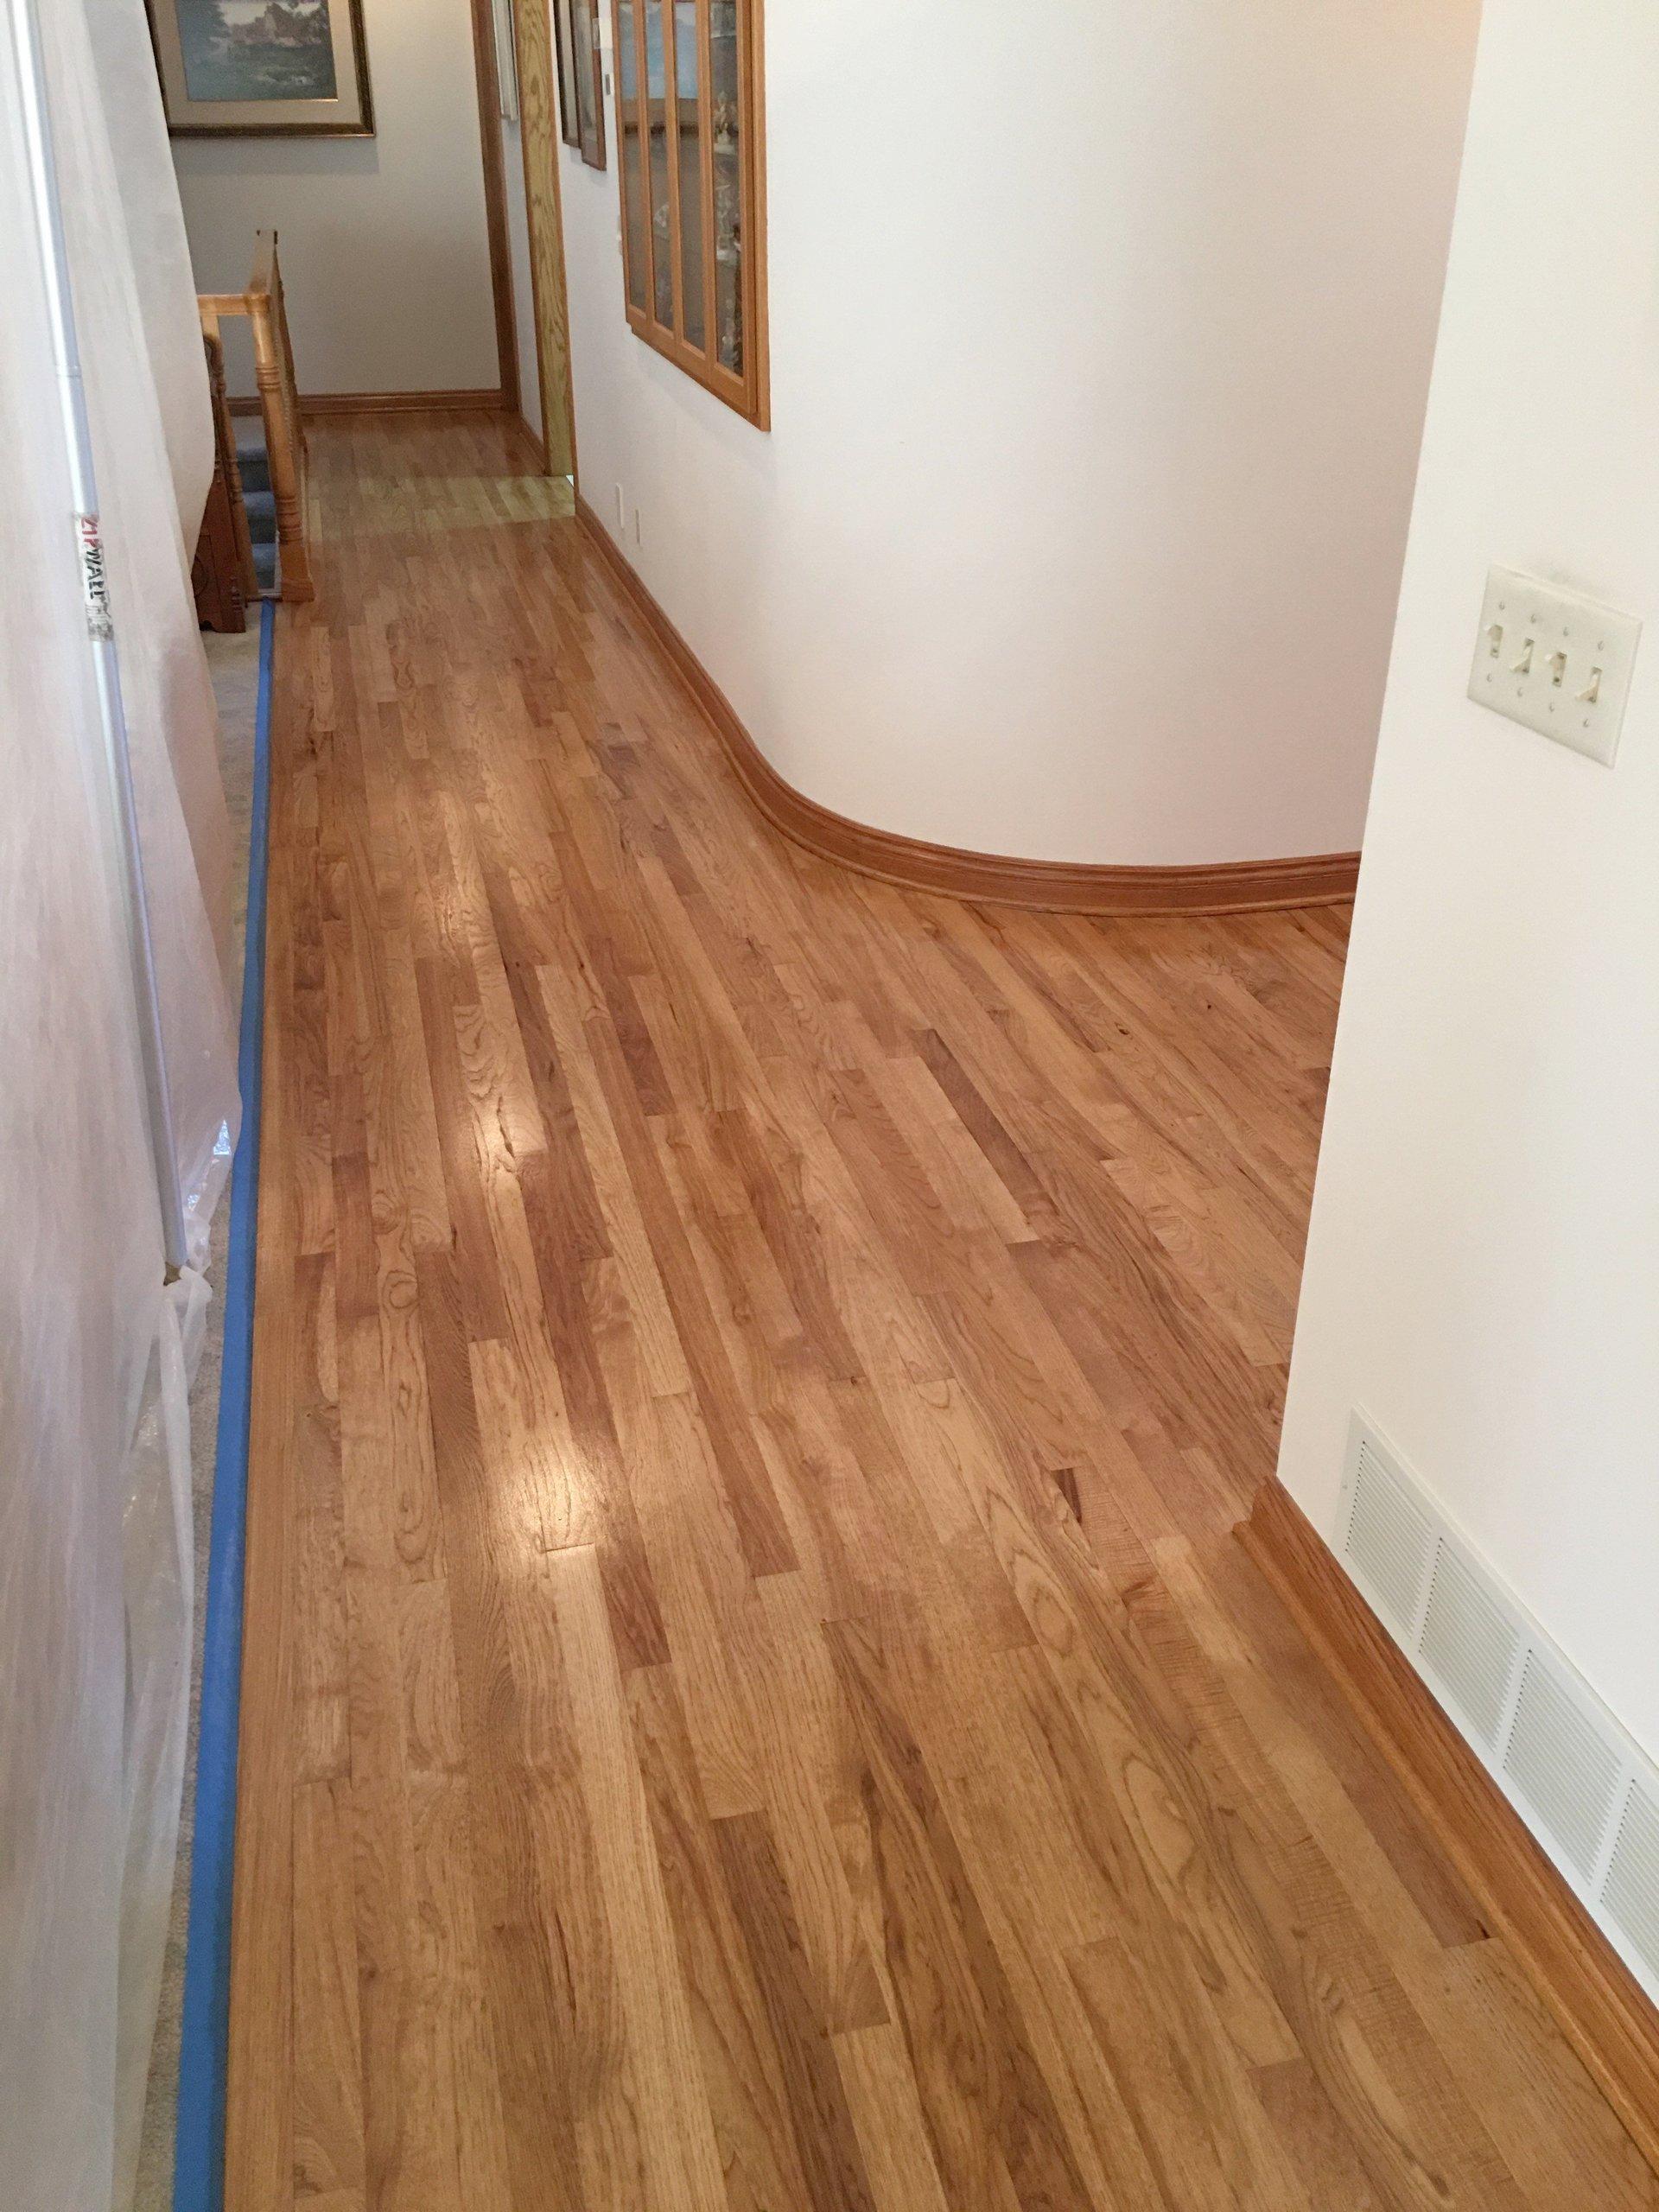 mt laminate flooring photo hardwood installation pexels floor tile services